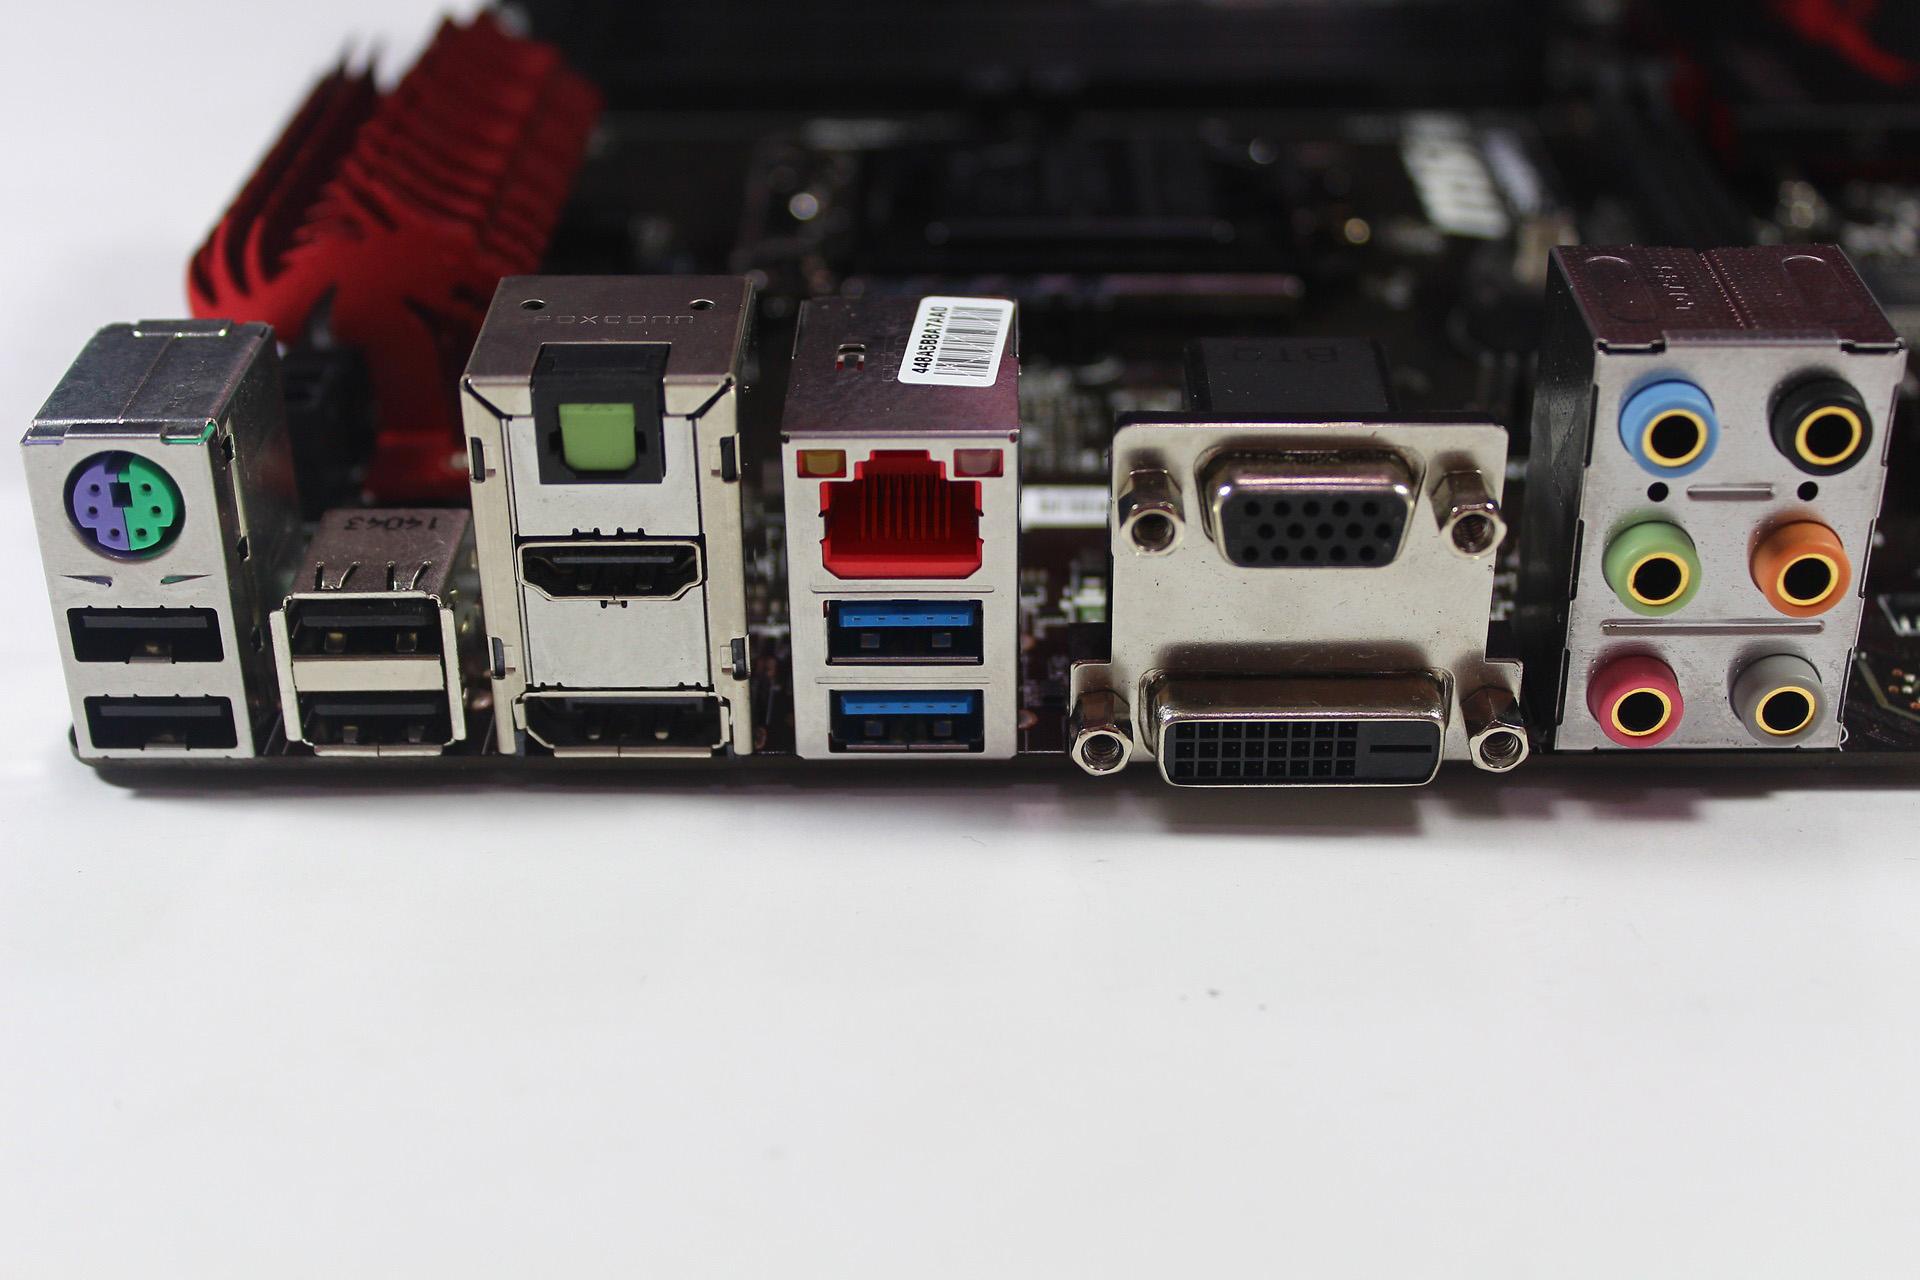 [XF] 電競風襲擊 MSI B85M Gaming 登場